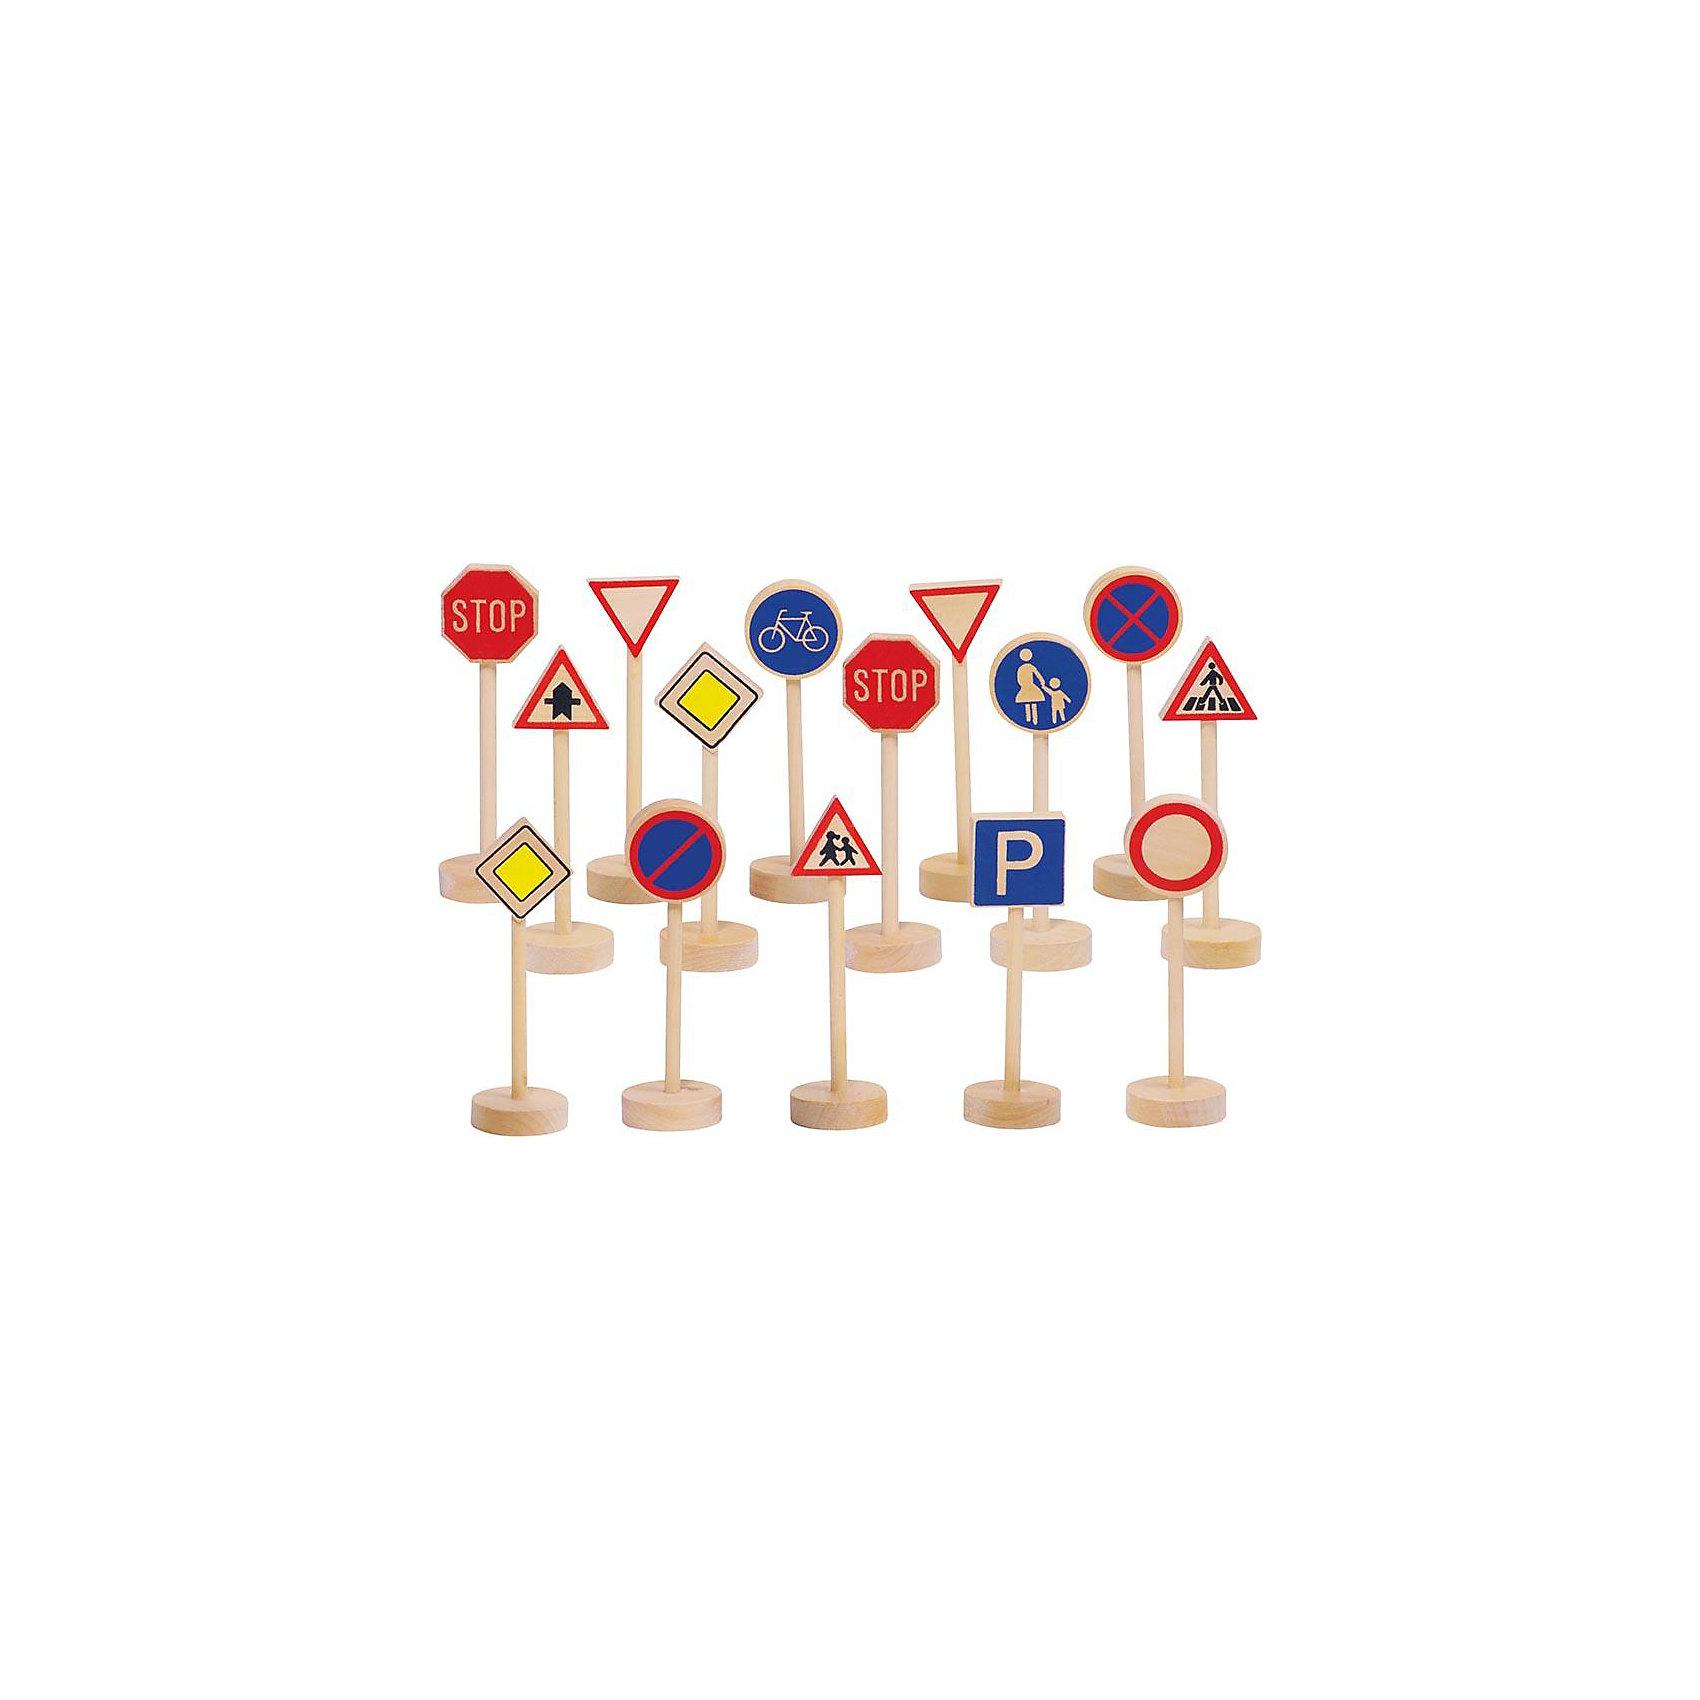 goki GOLLNEST & KIESEL Дорожные знаки TOYS PURE фигурки игрушки лэм дорожные знаки